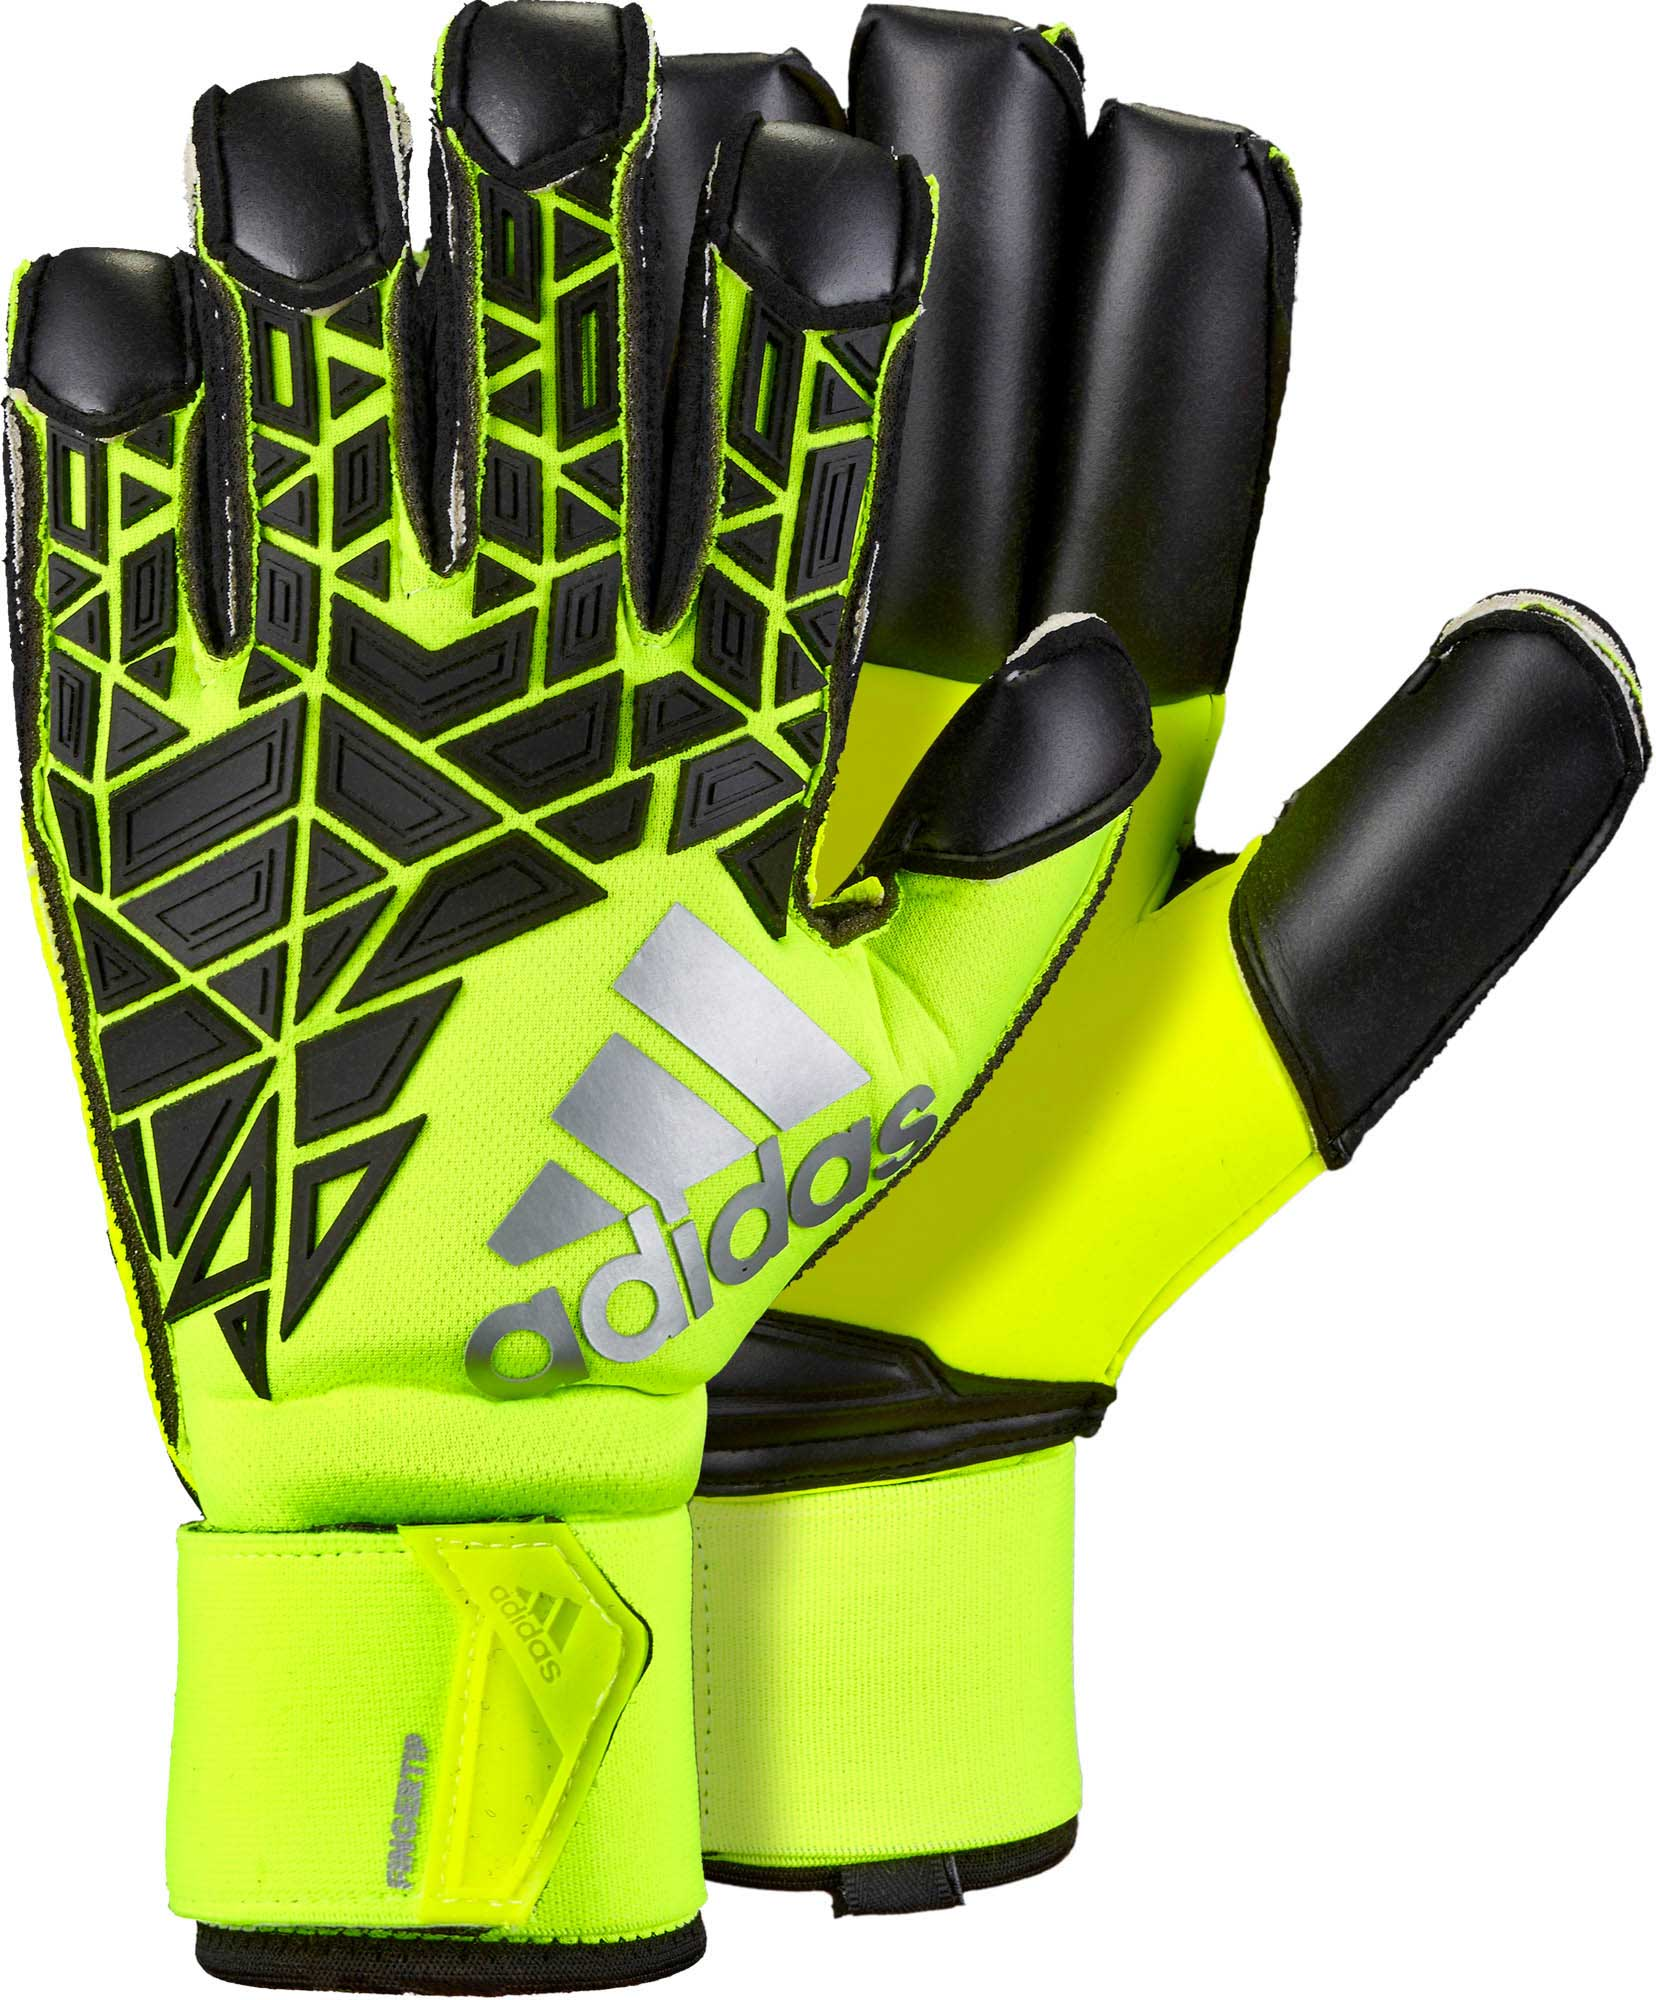 adidas ace gloves